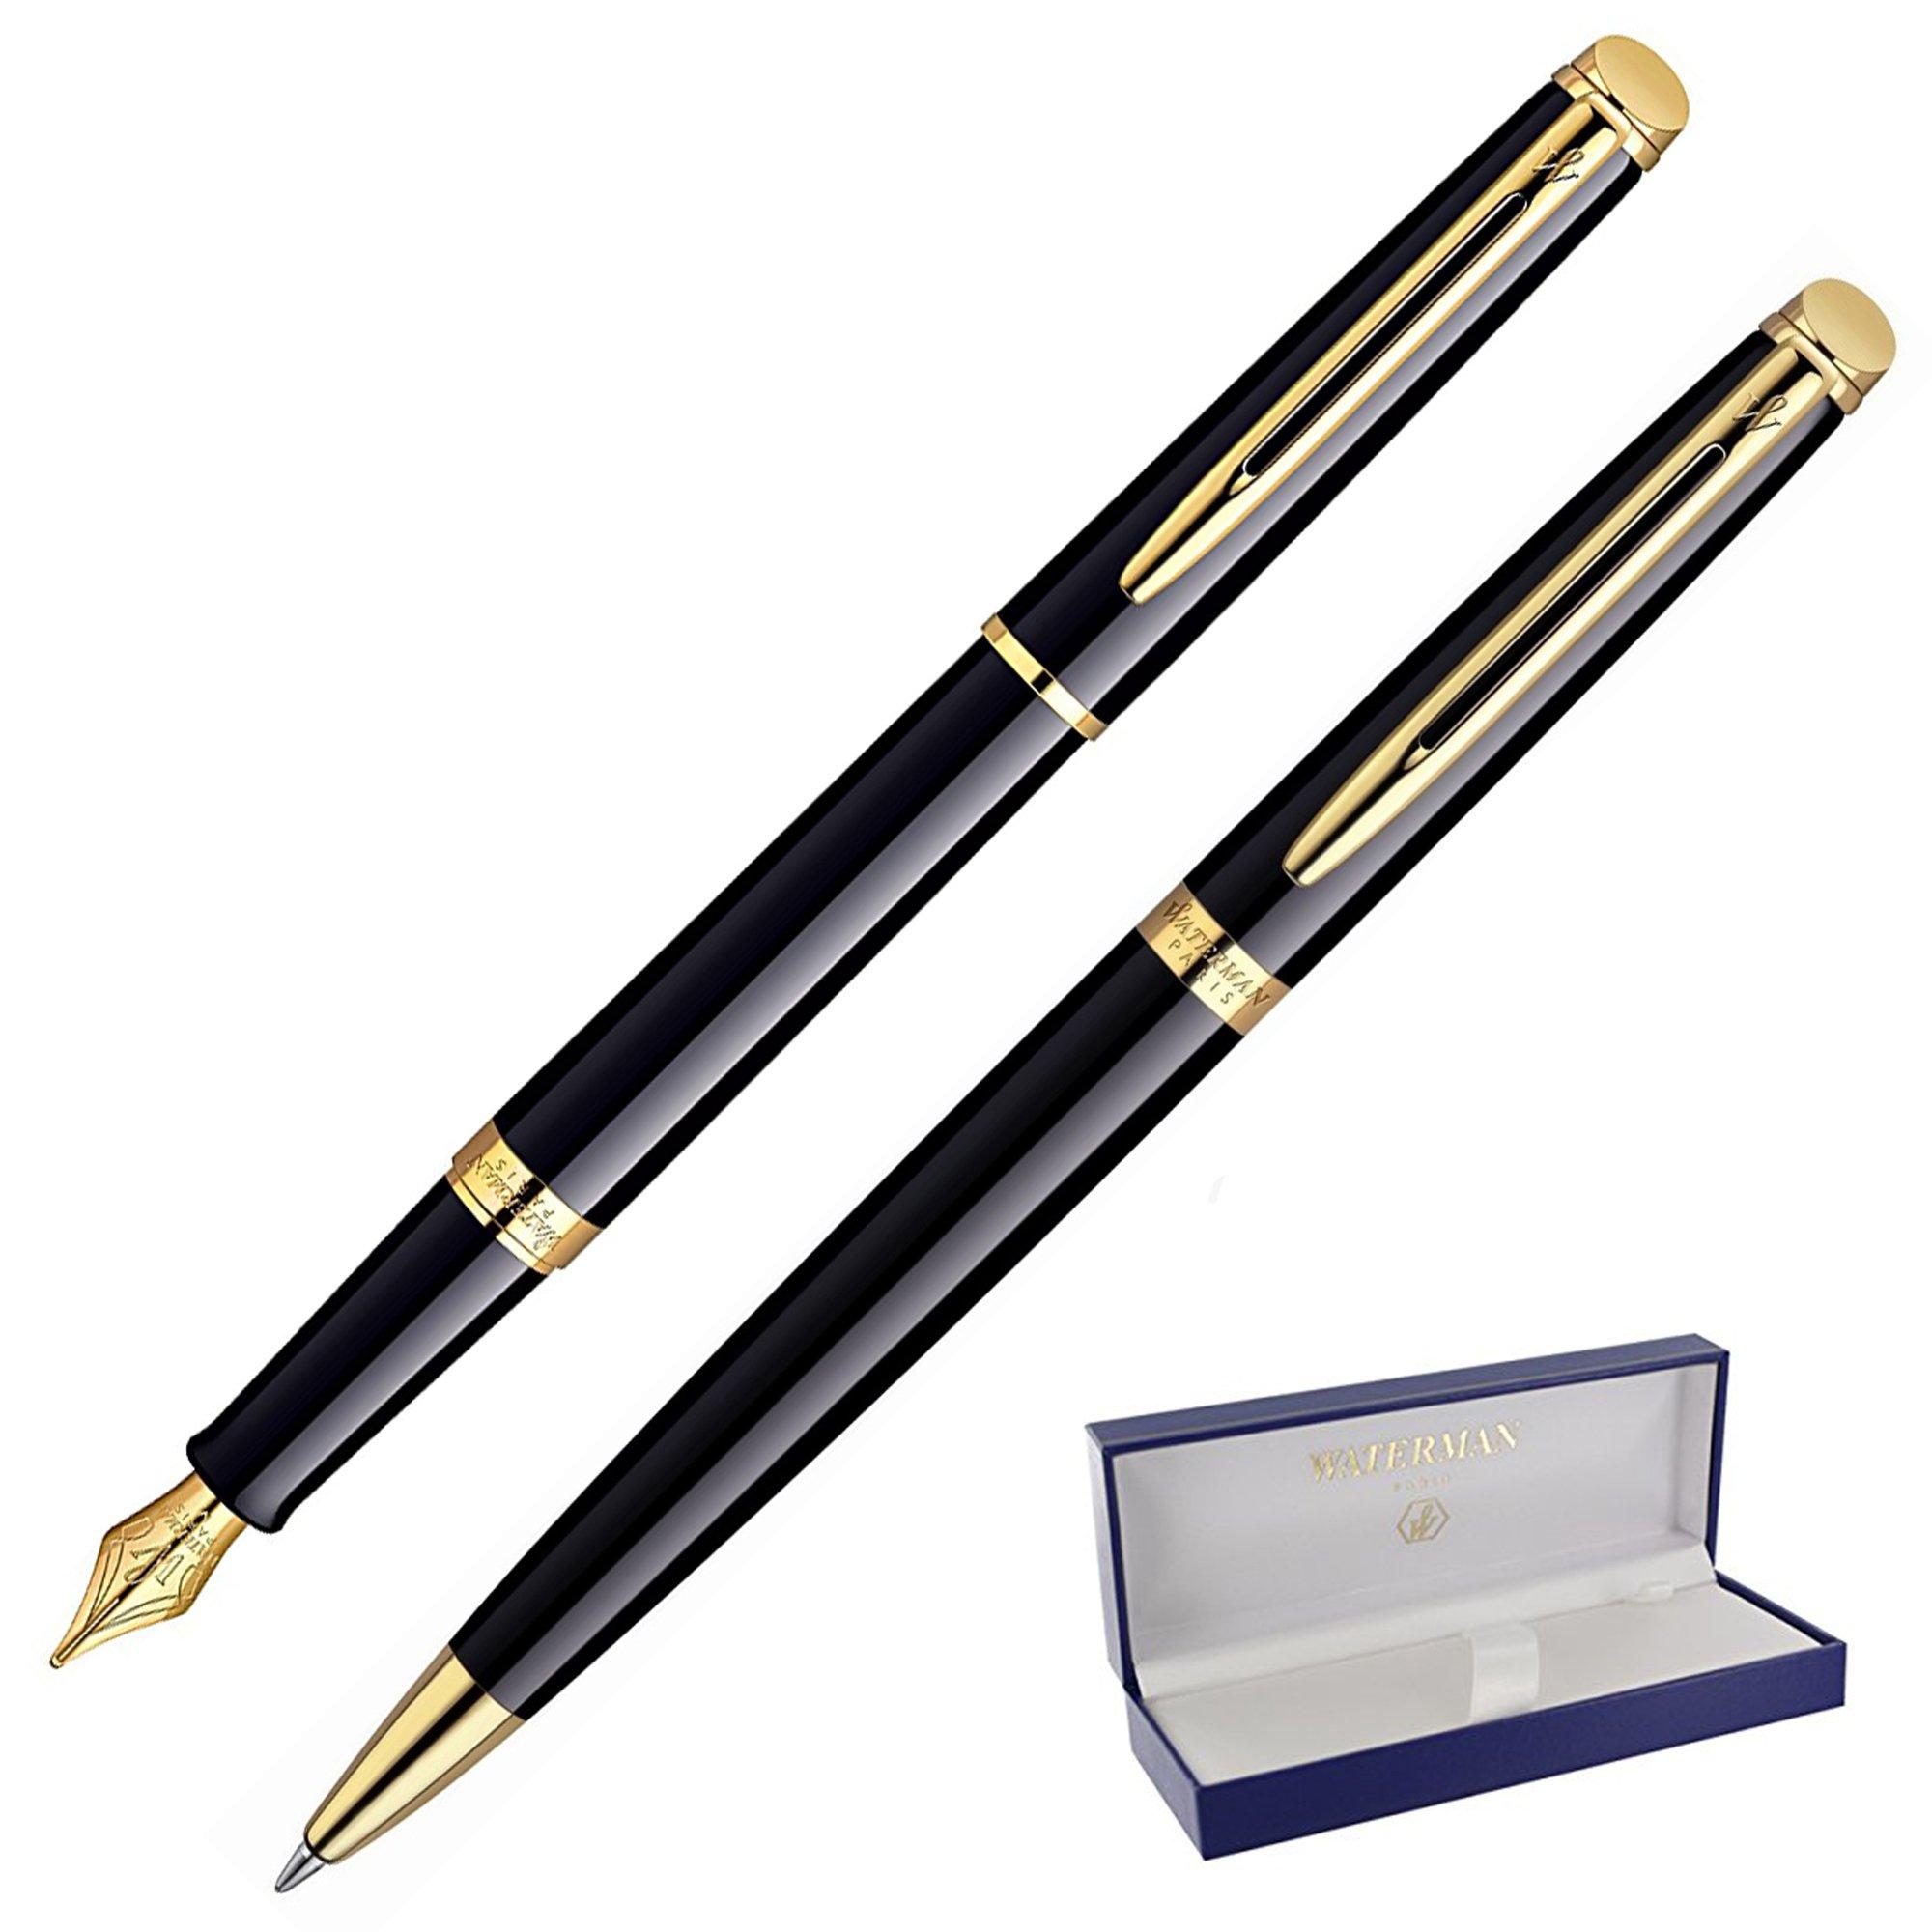 Dayspring Pens - Personalized WATERMAN Hemisphere Fountain & Ballpoint Gift Pen Set - Black. Custom Engraved Fast!